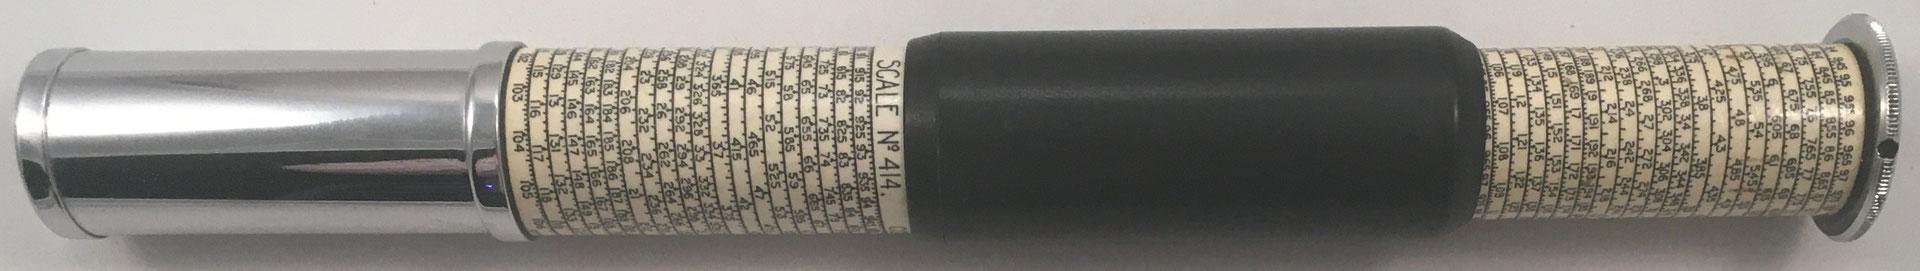 OTIS KING'S Poket Calculator, Modelo K tipo Xa, escalas nº 414 y nº 423, s/n U6318, made in England, año 1963, 3 cm diámetro (longitud: 15 cm cerrada, 26 cm desplegada),  (precio estimado: 100€)